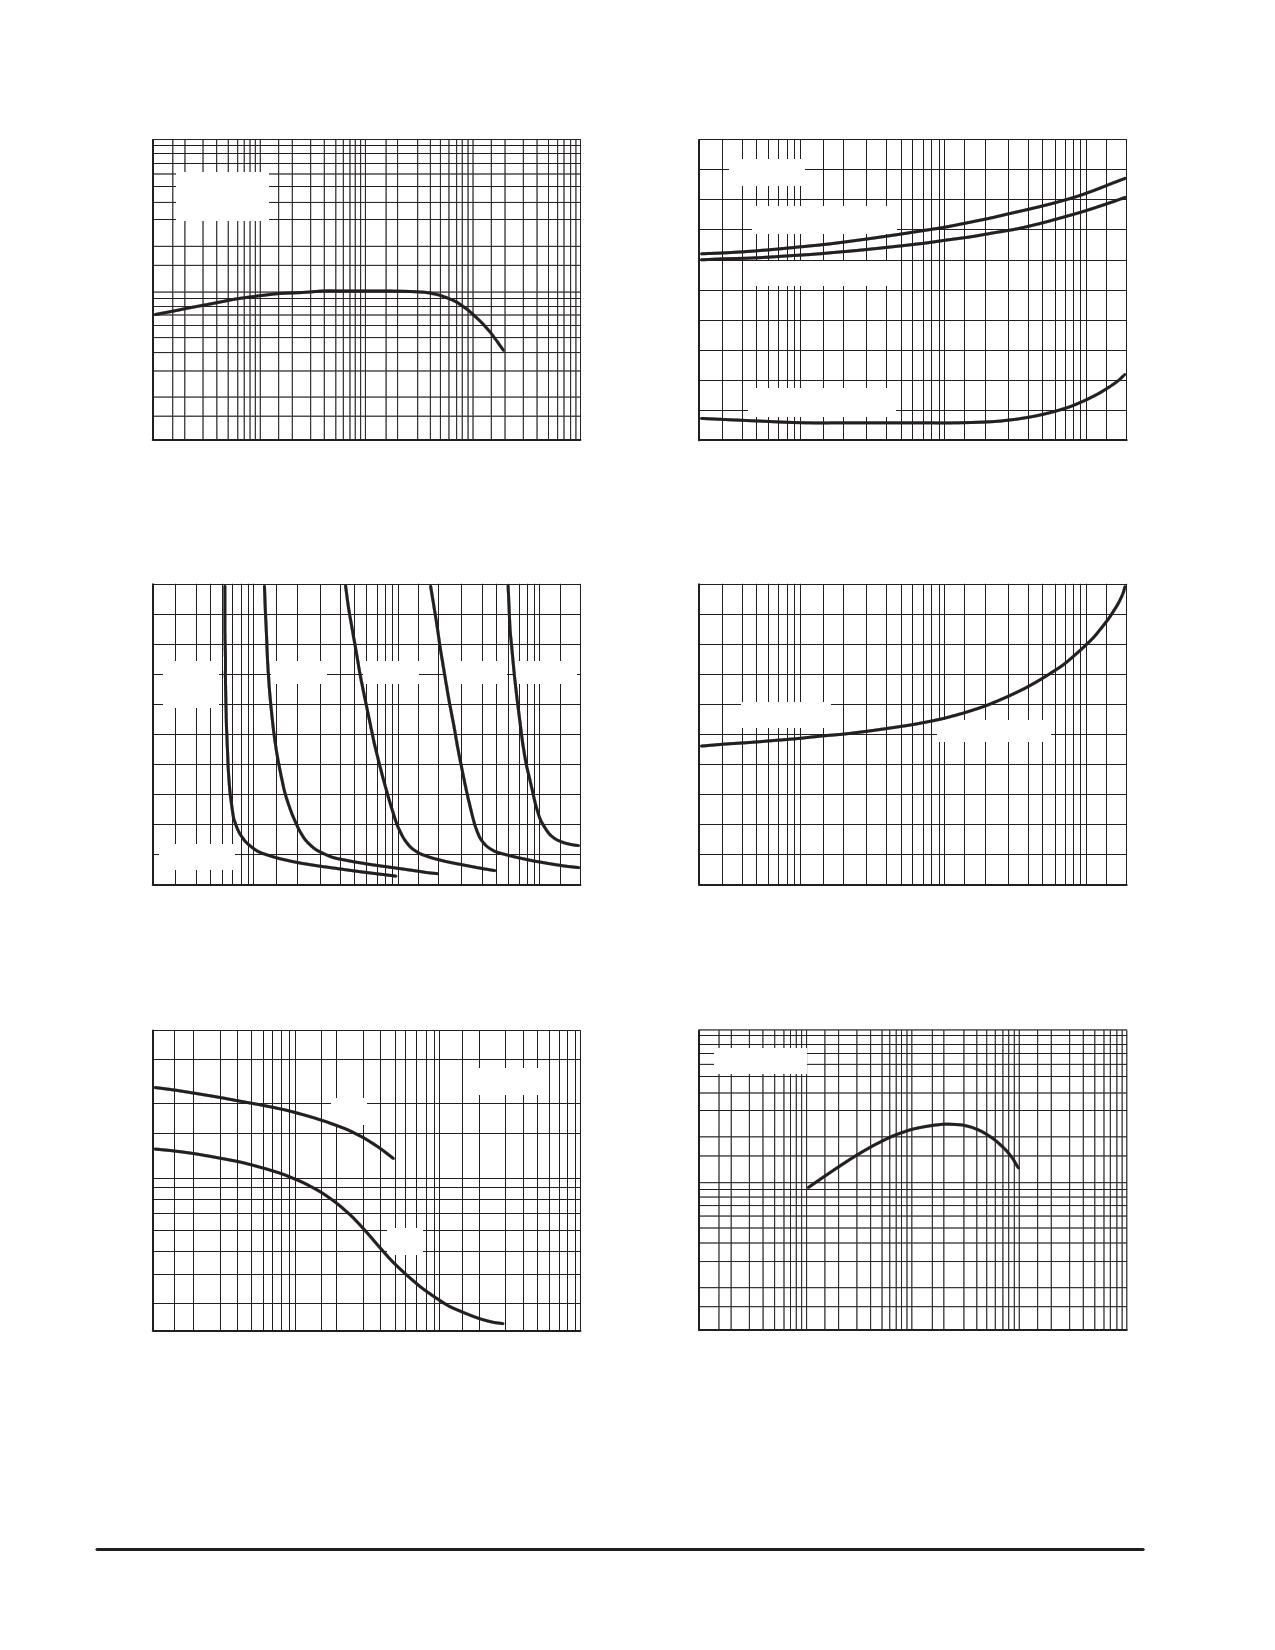 BC558 pdf, 반도체, 판매, 대치품